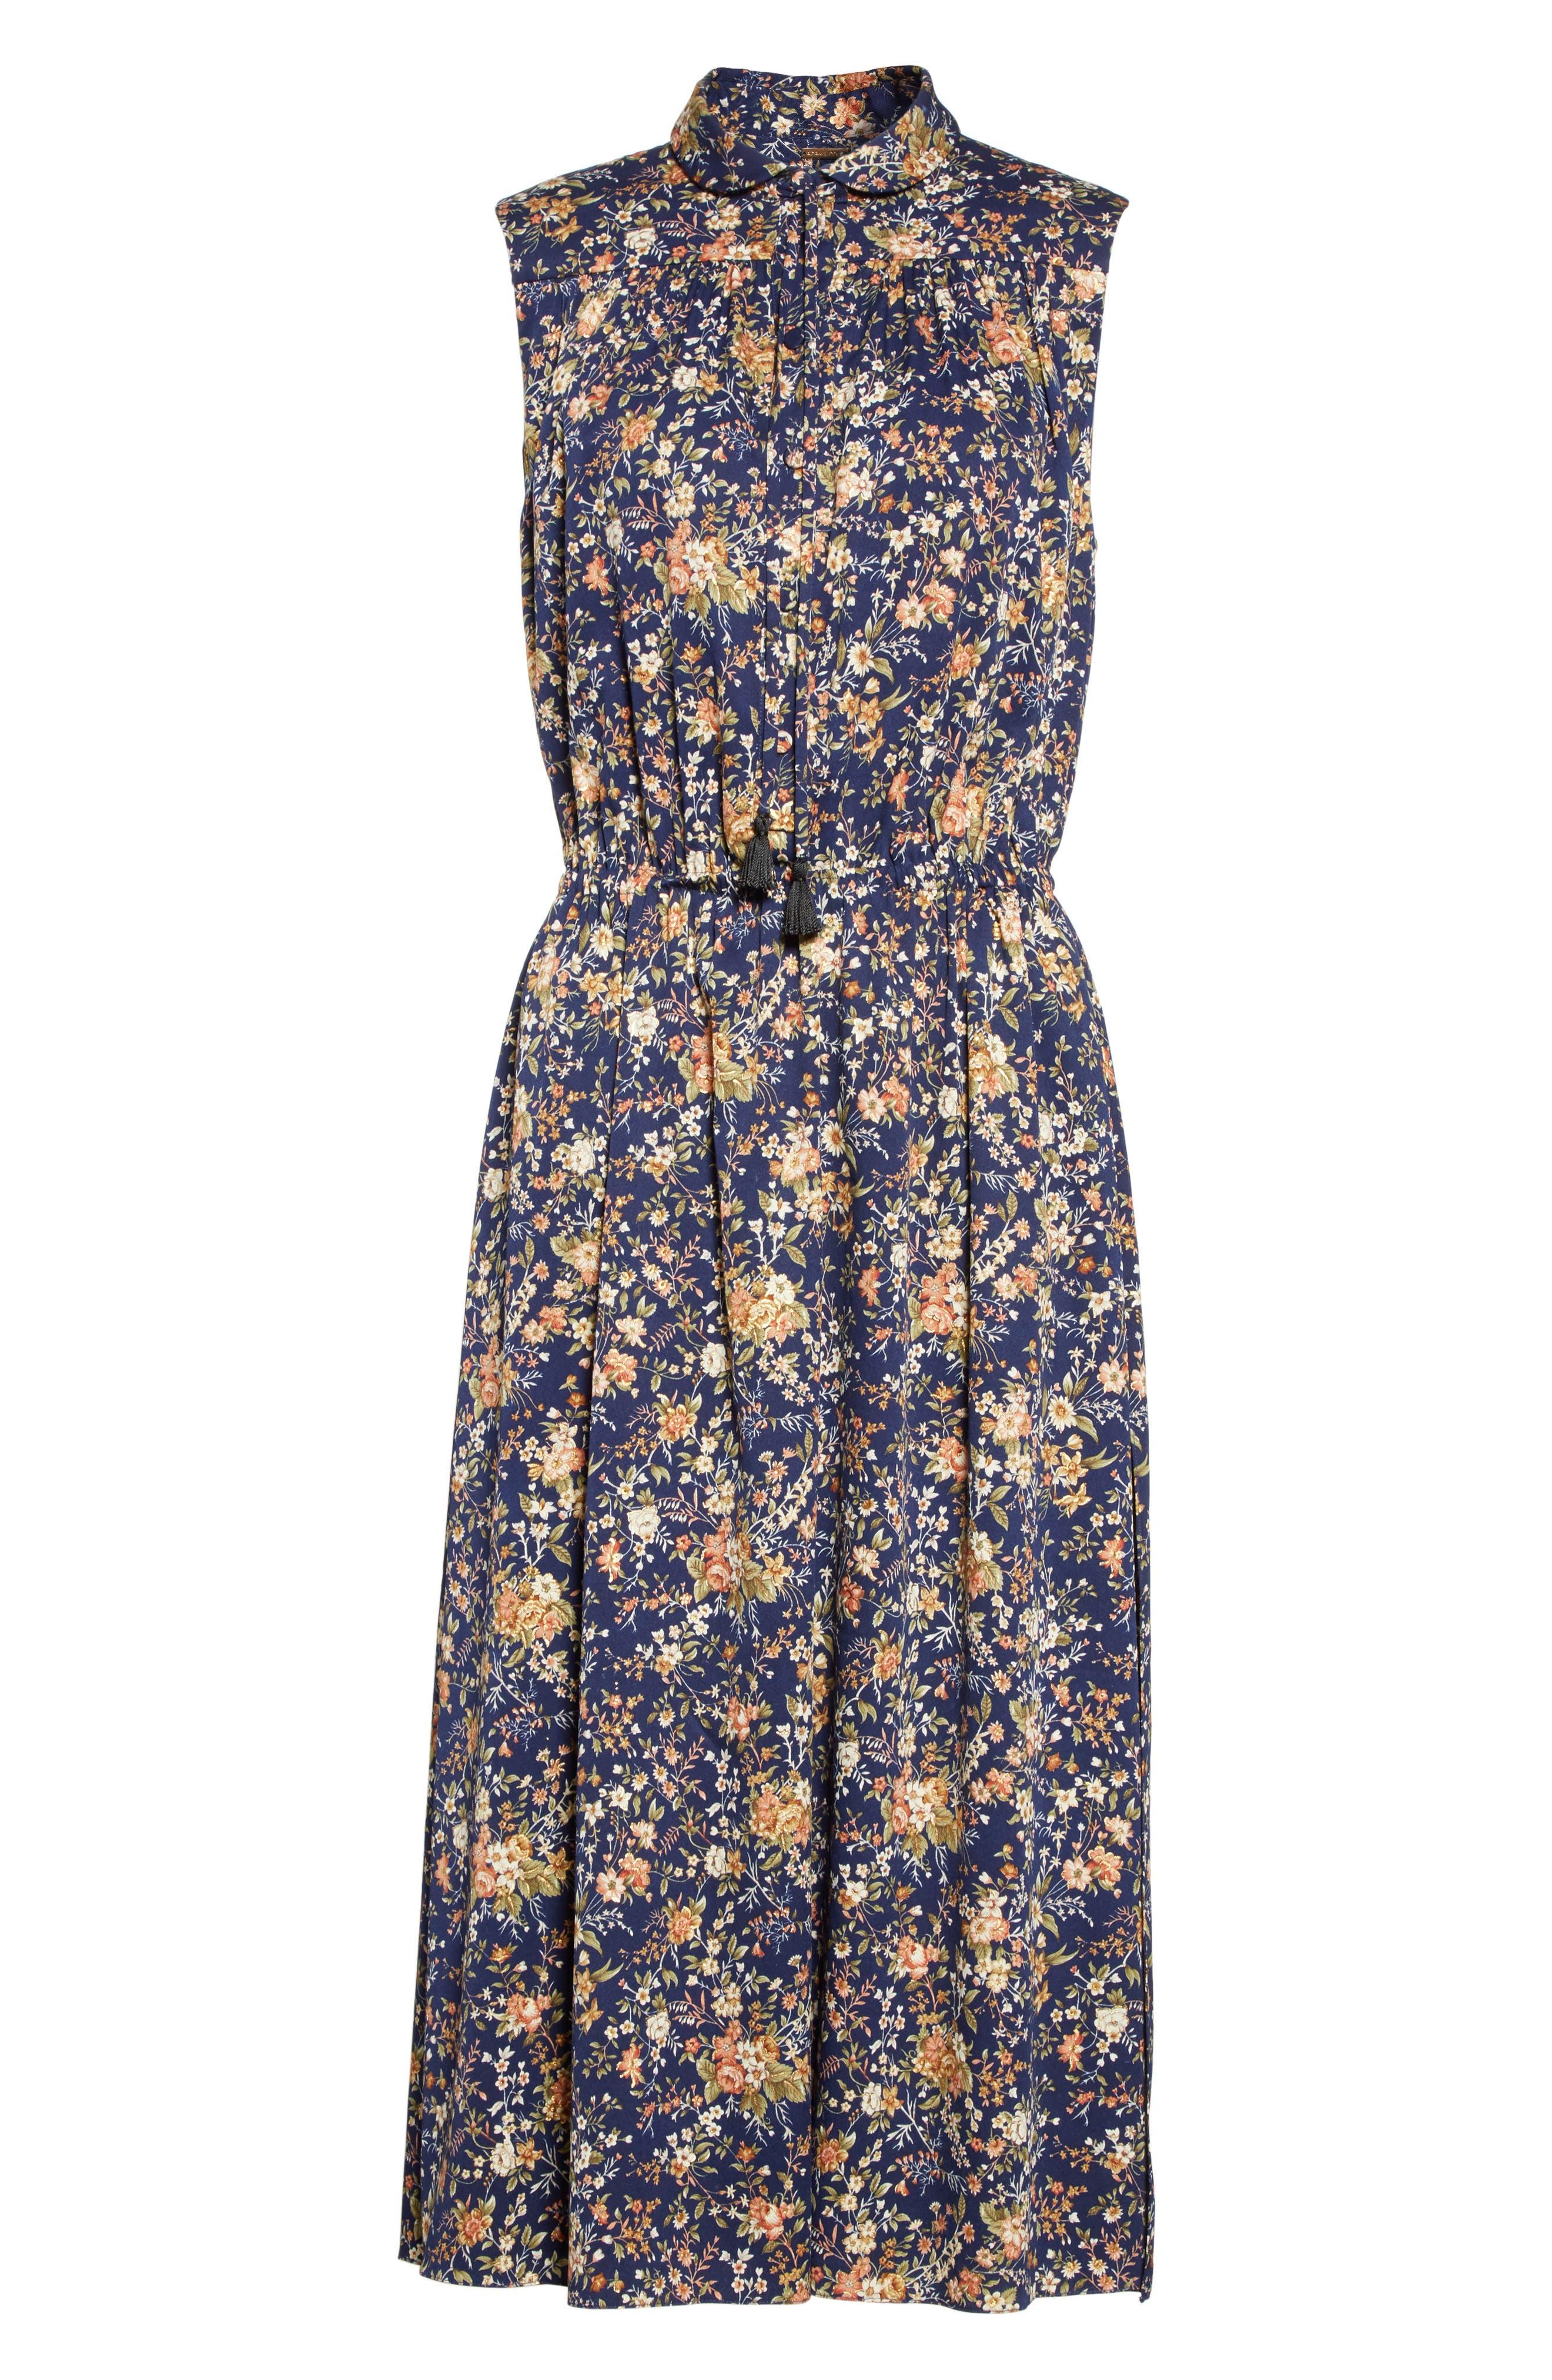 Floral Print Silk Dress,                             Alternate thumbnail 6, color,                             Navy